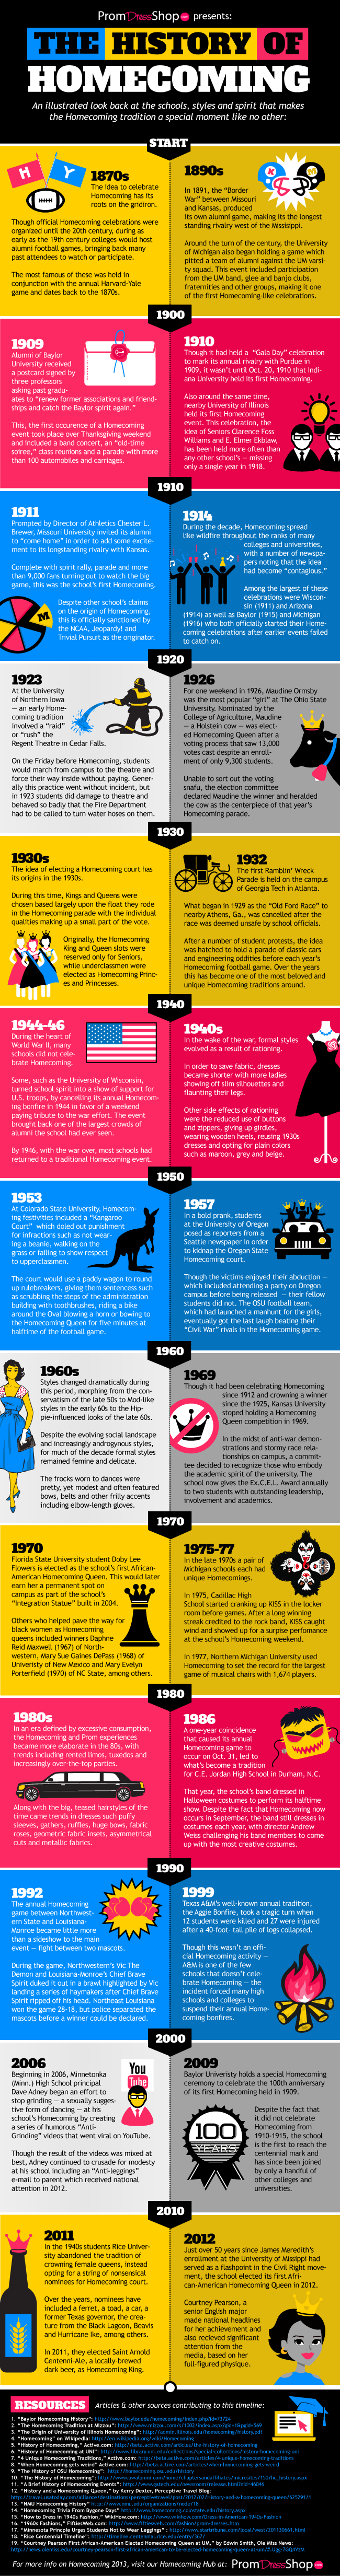 History of Homecoming